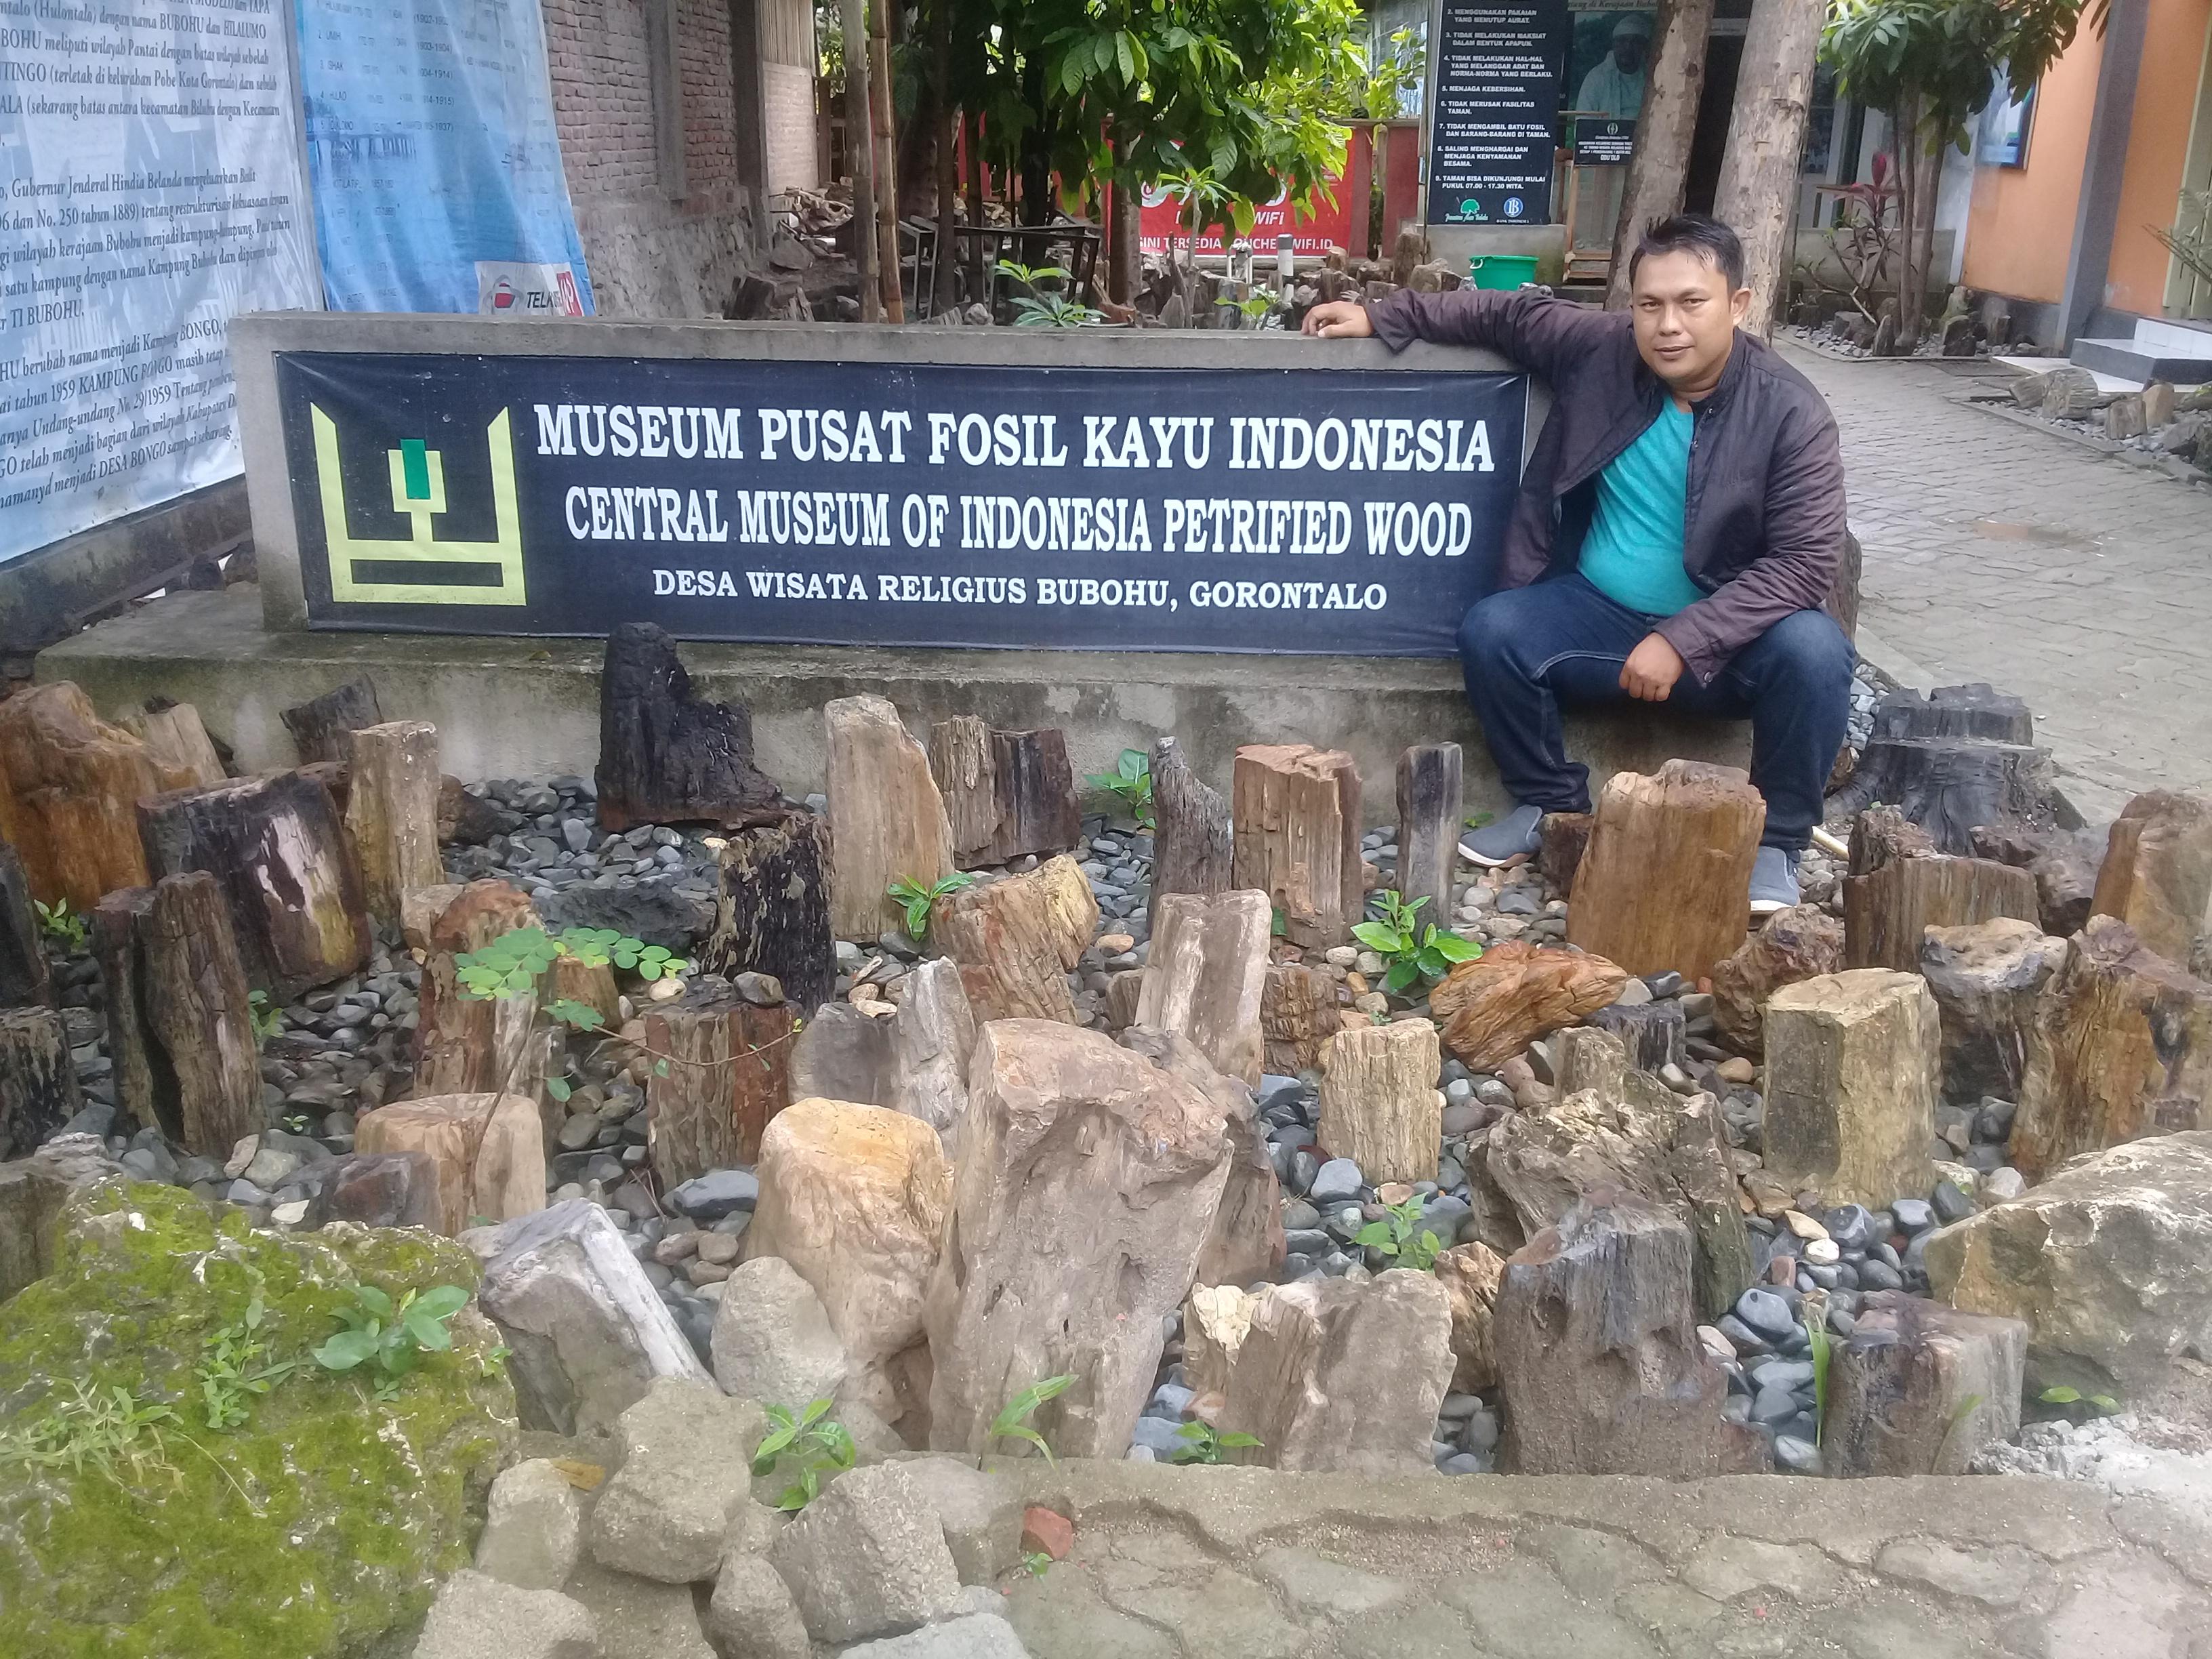 Objek Wisata Bisnis Gorontalo Cahaya Pose Sejenak Depan Museum Pusat